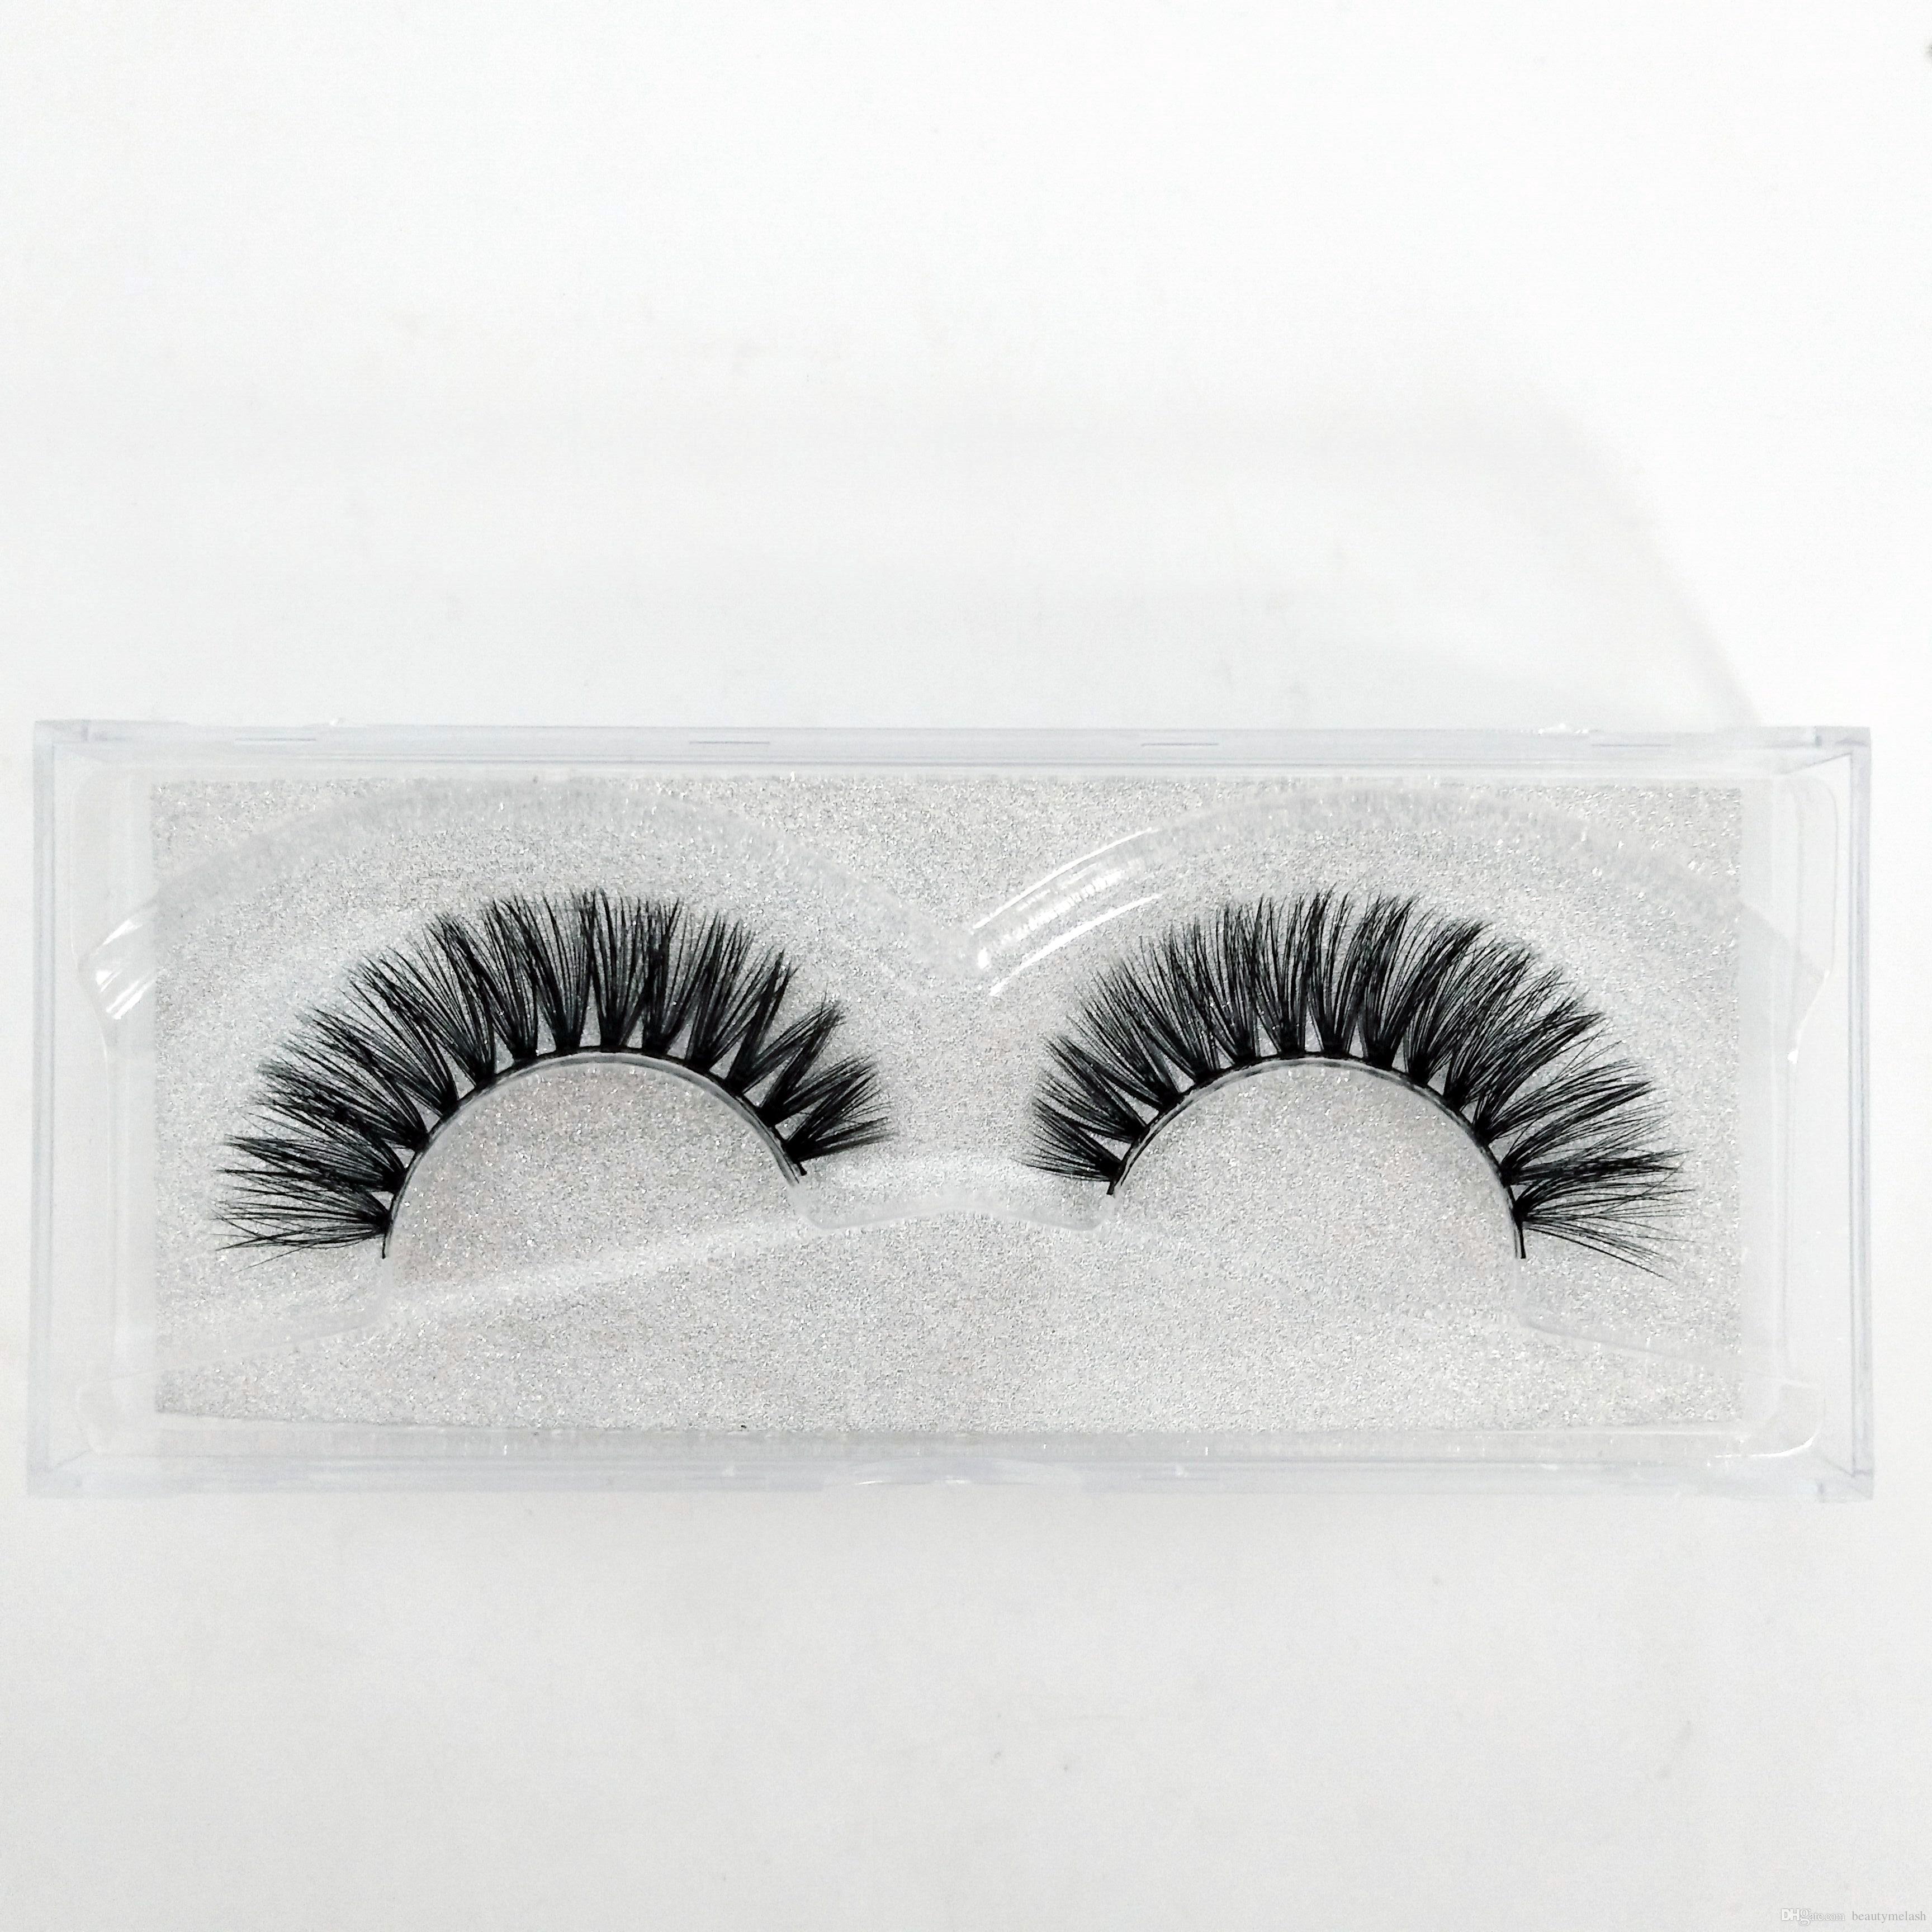 c1d6b59ce57 Hot Sale 3D Mink False Eyelashes Handmade Natural Long Curl Thick ...